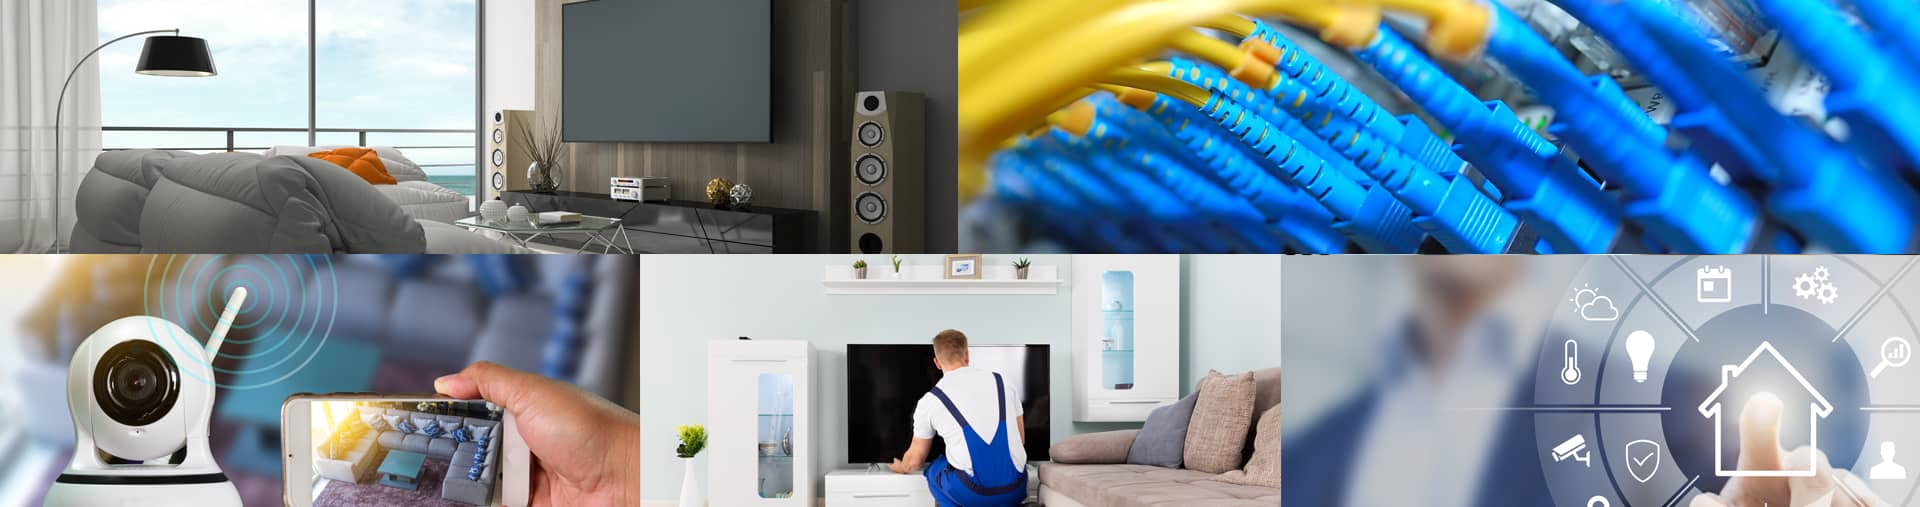 Home Automation Installation Company